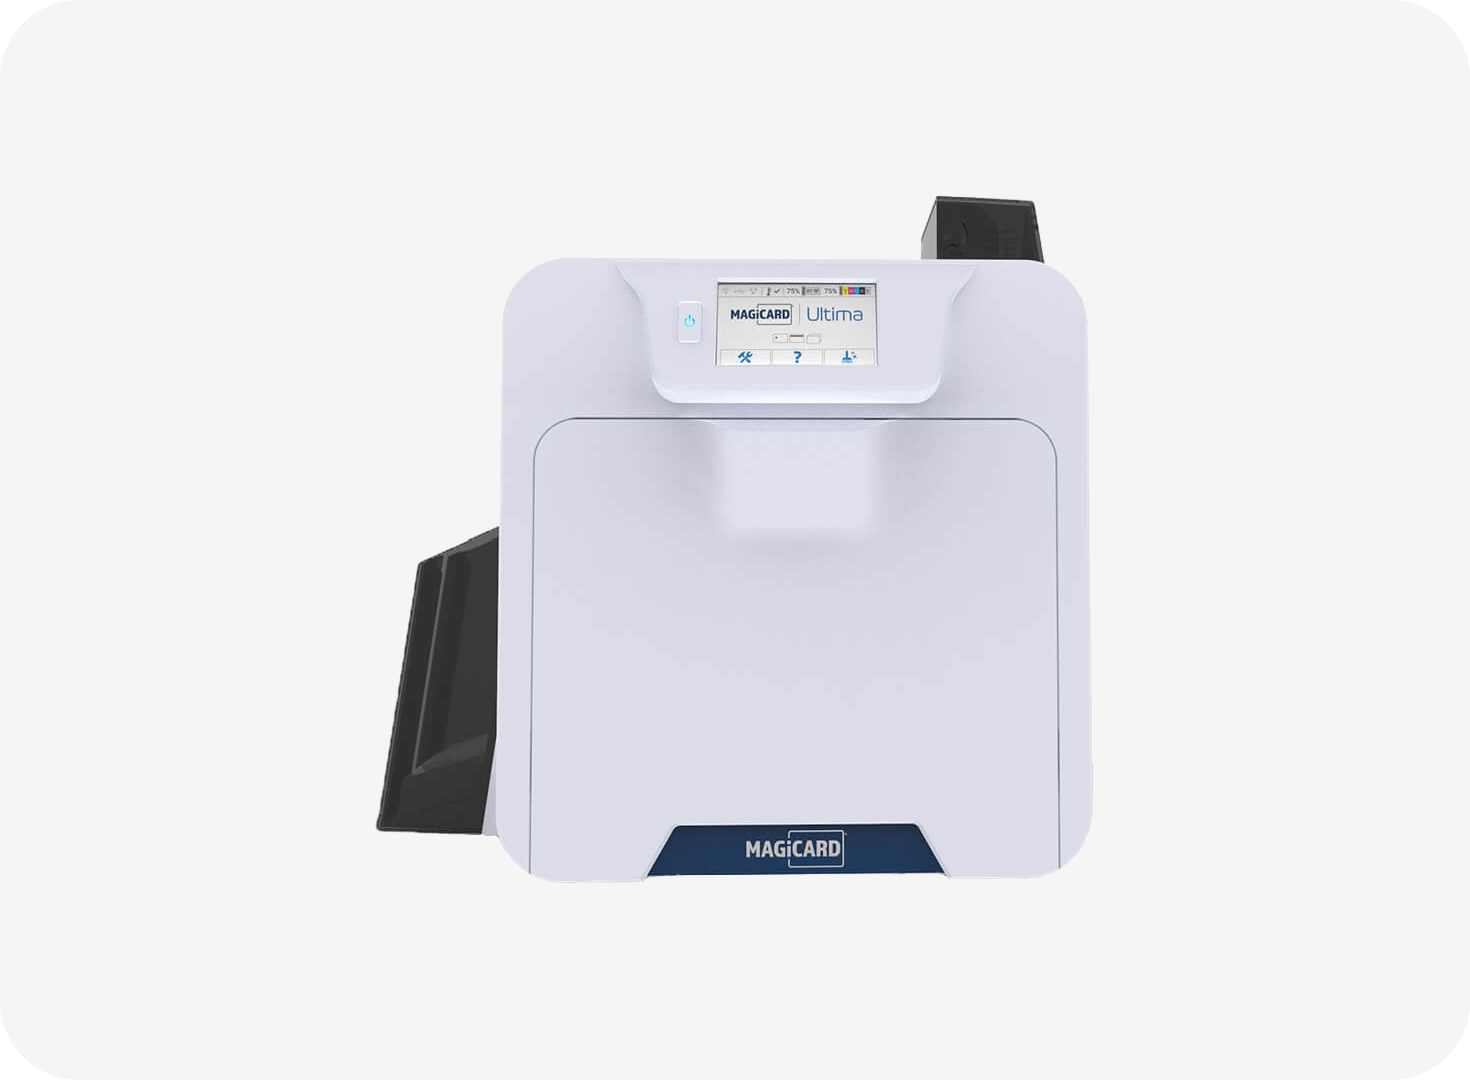 Magicard Ultima retransfer card printer